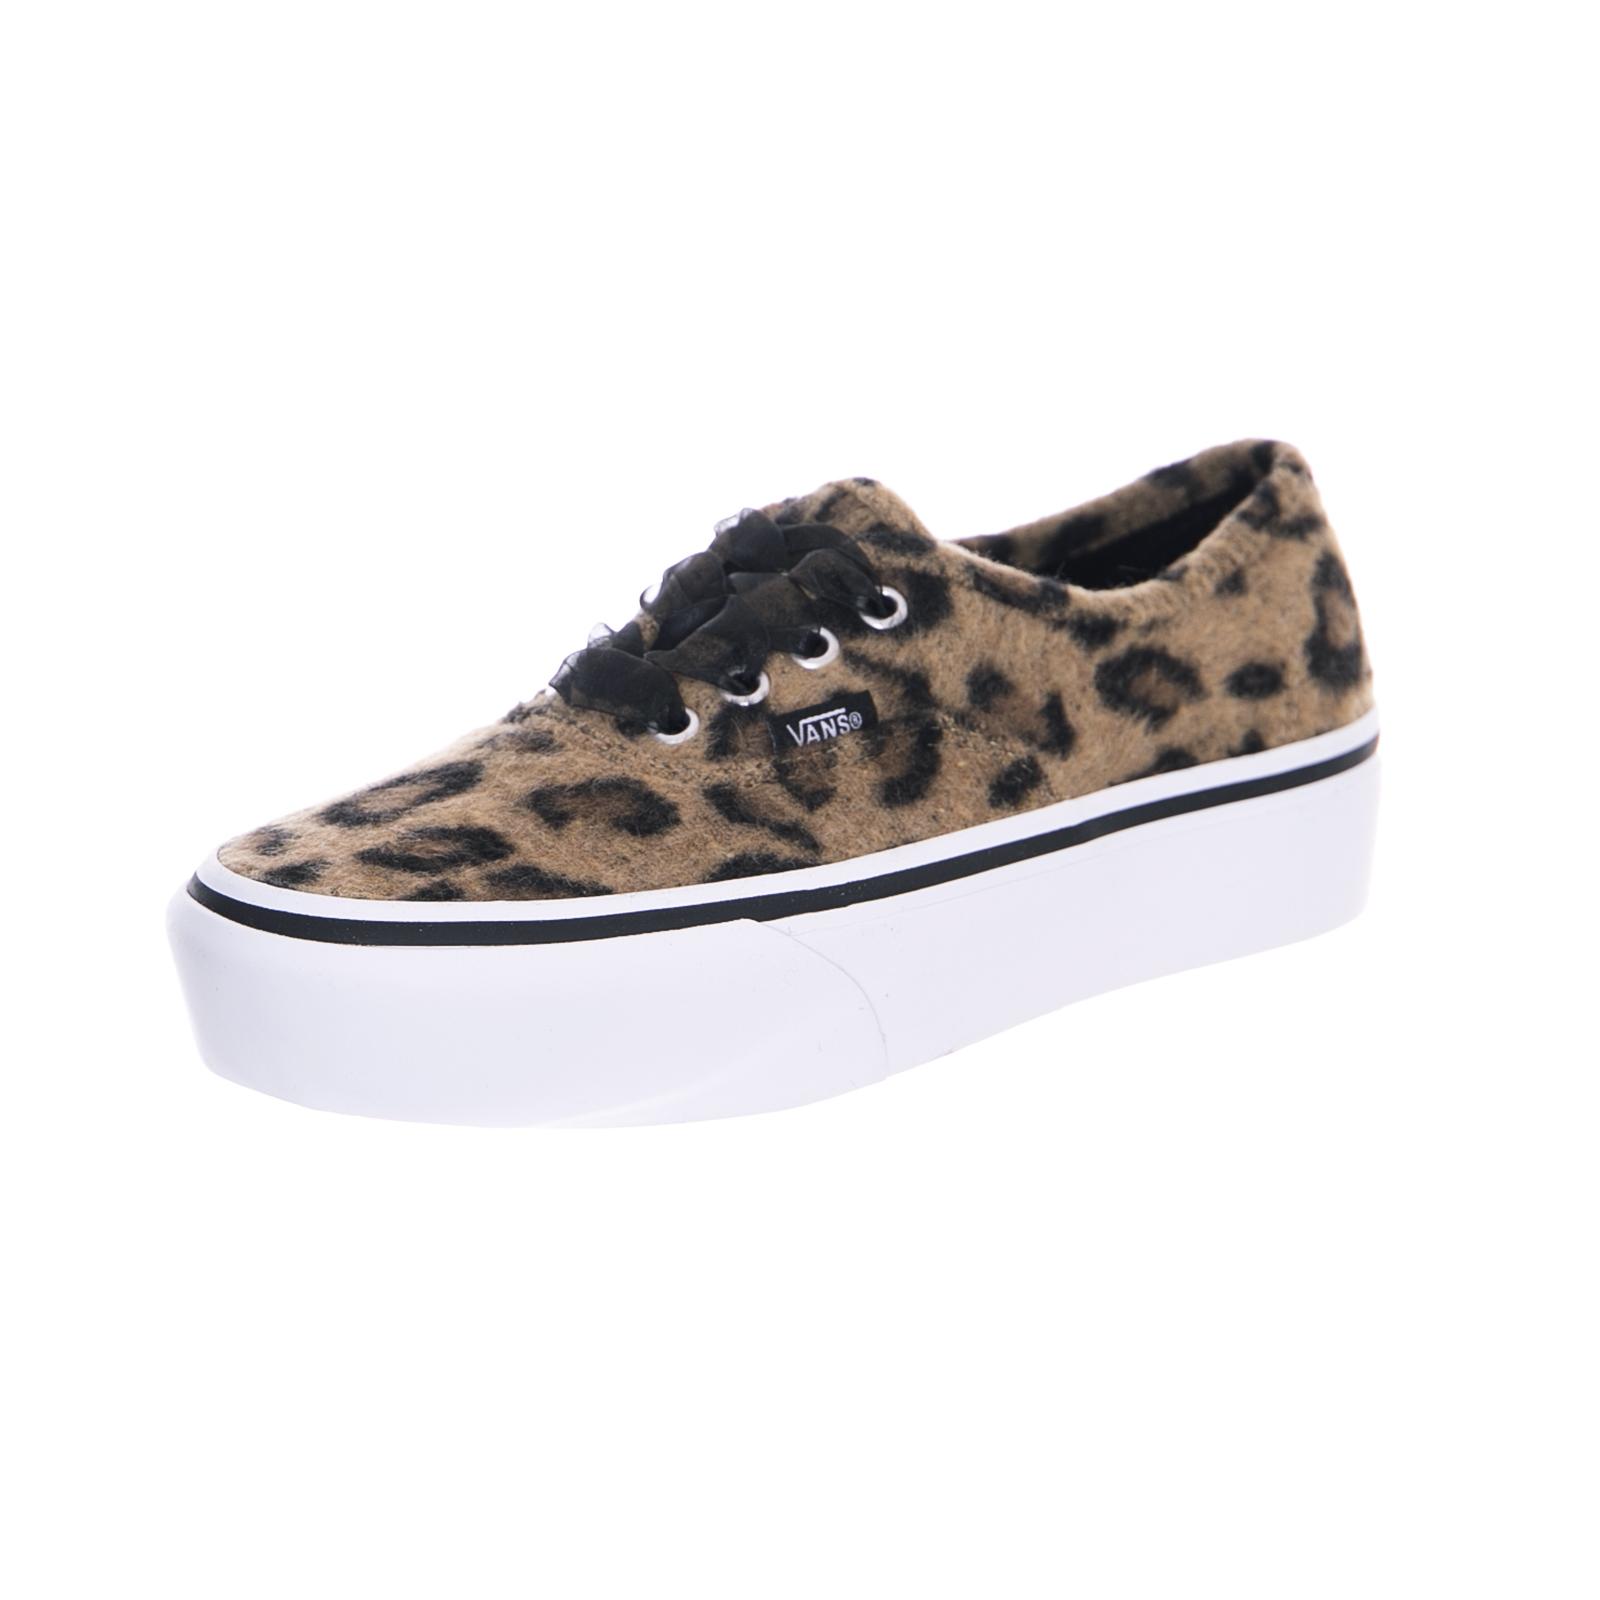 a4ae5f5af5 Vans sneakers authentic platform 2.0 (fuzzy) leopard true white multicolor